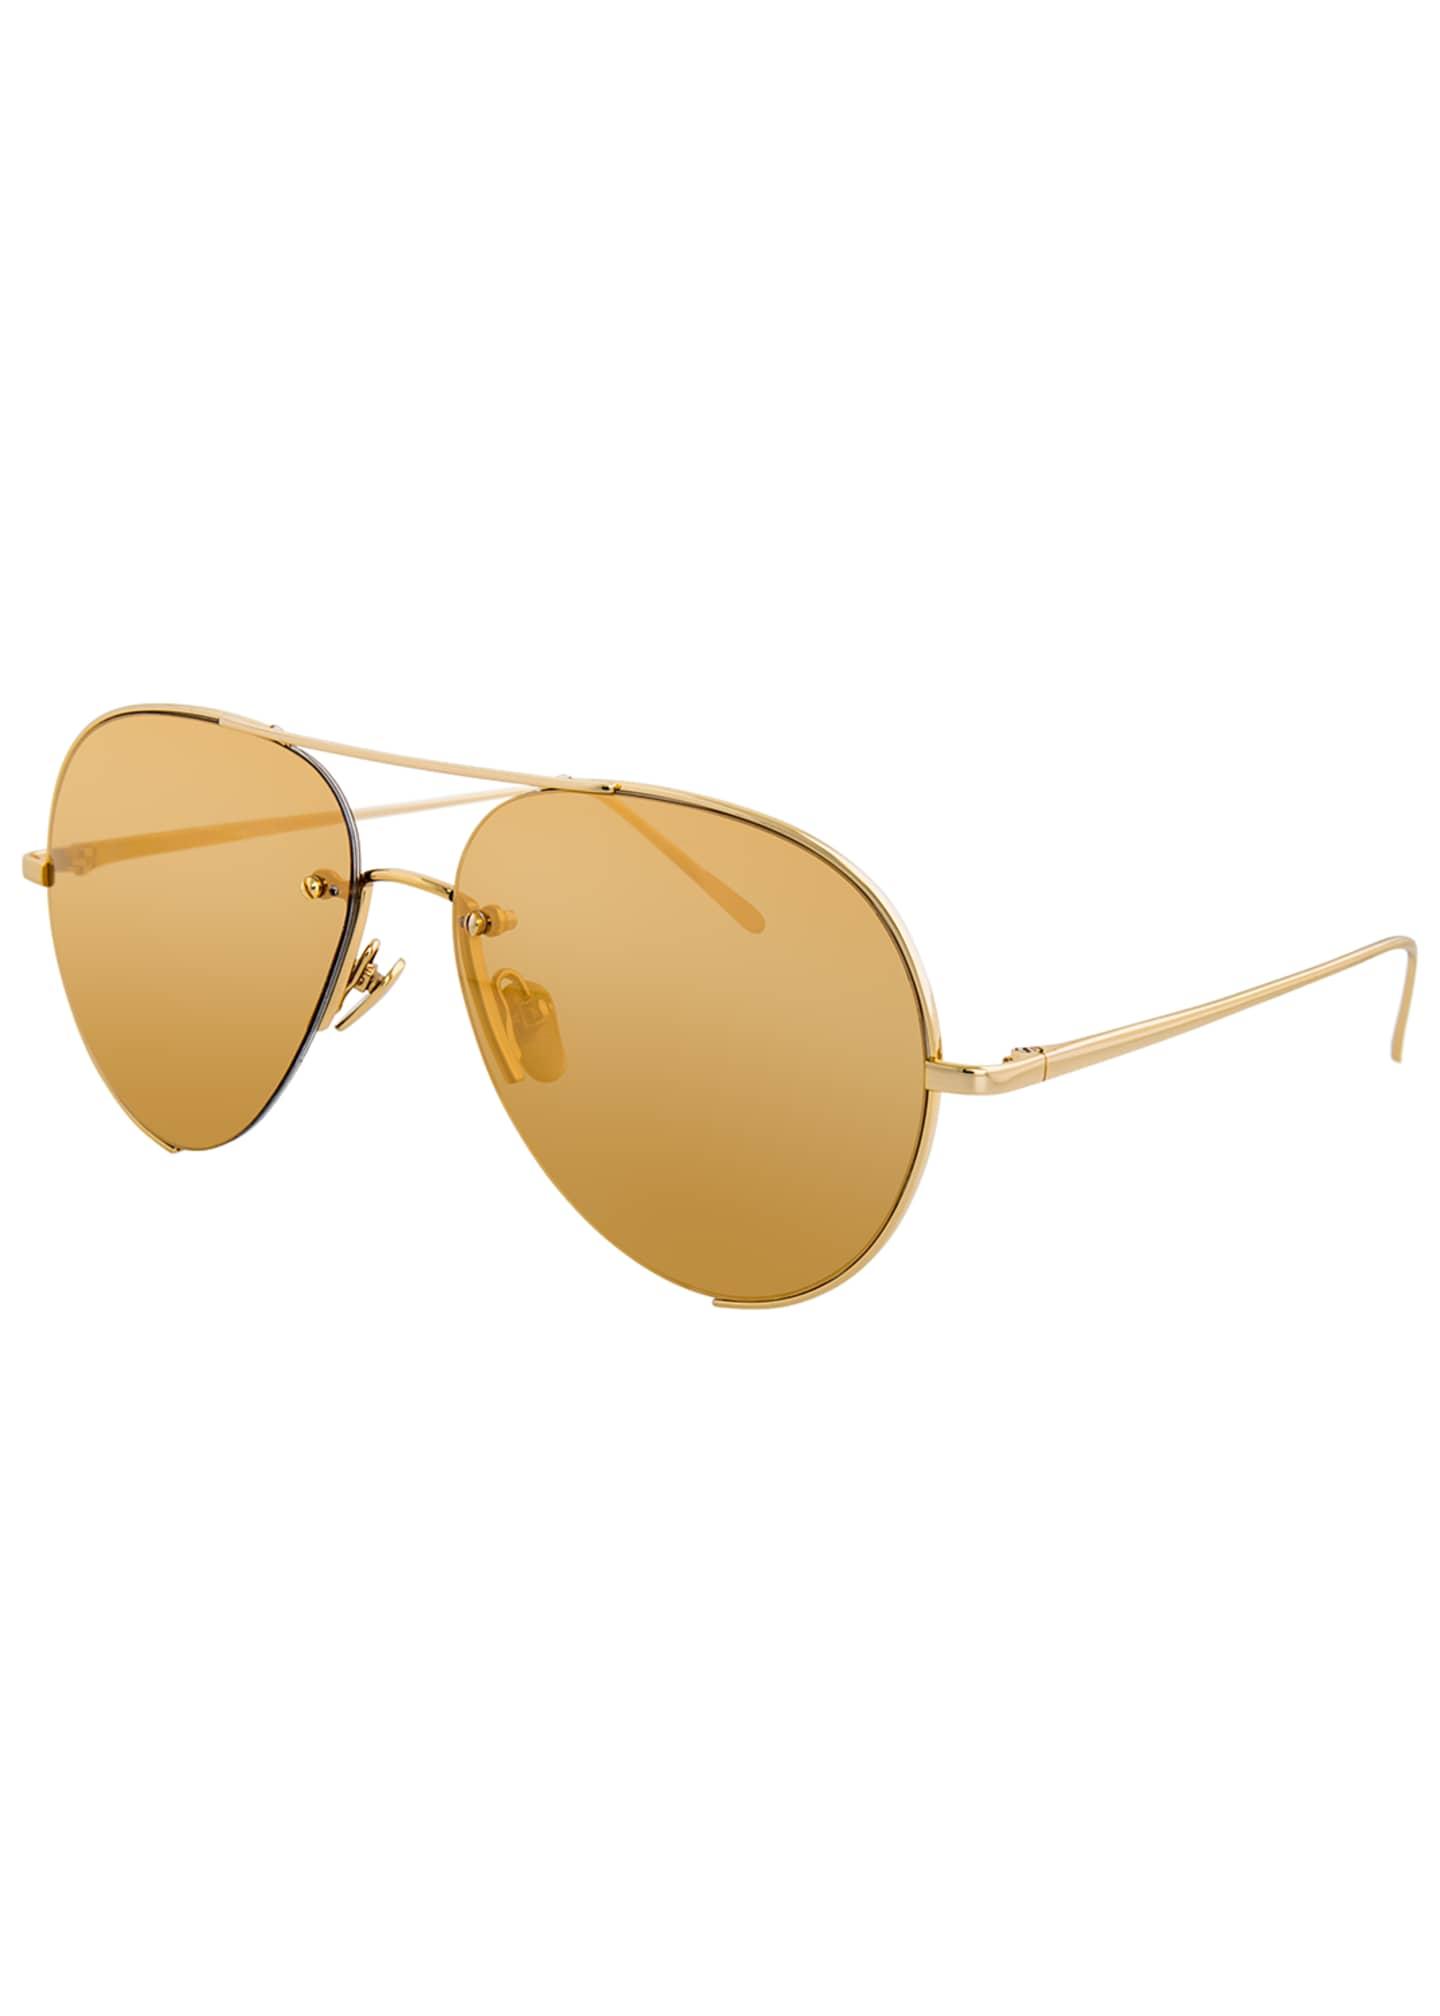 Linda Farrow Semi-Rimless Aviator Sunglasses, Yellow Pattern